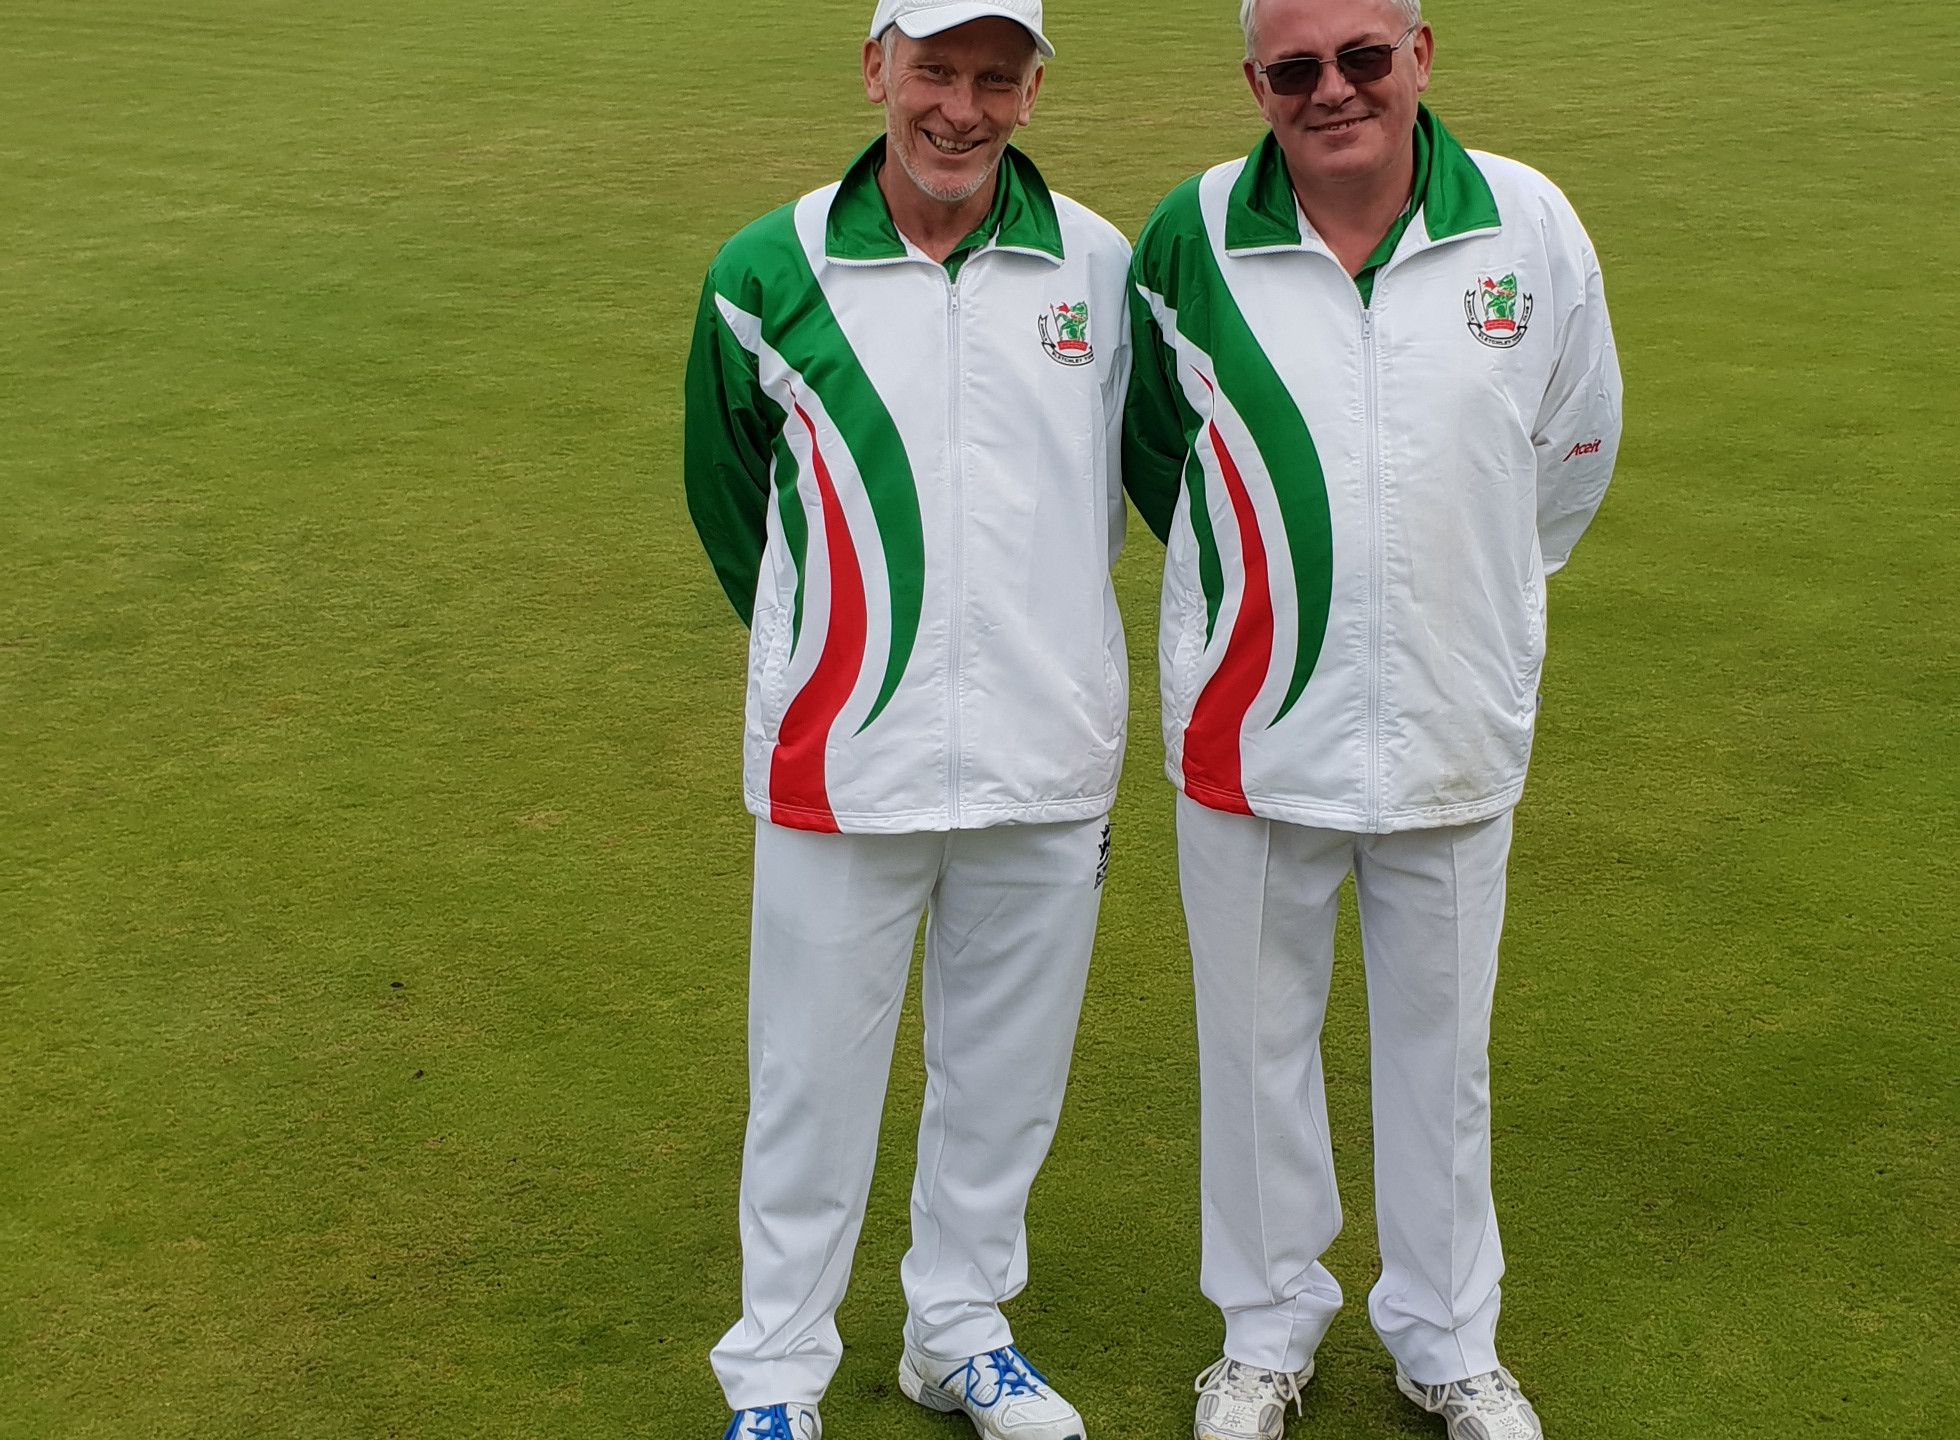 Gerry Smyth + Malcolm Drage